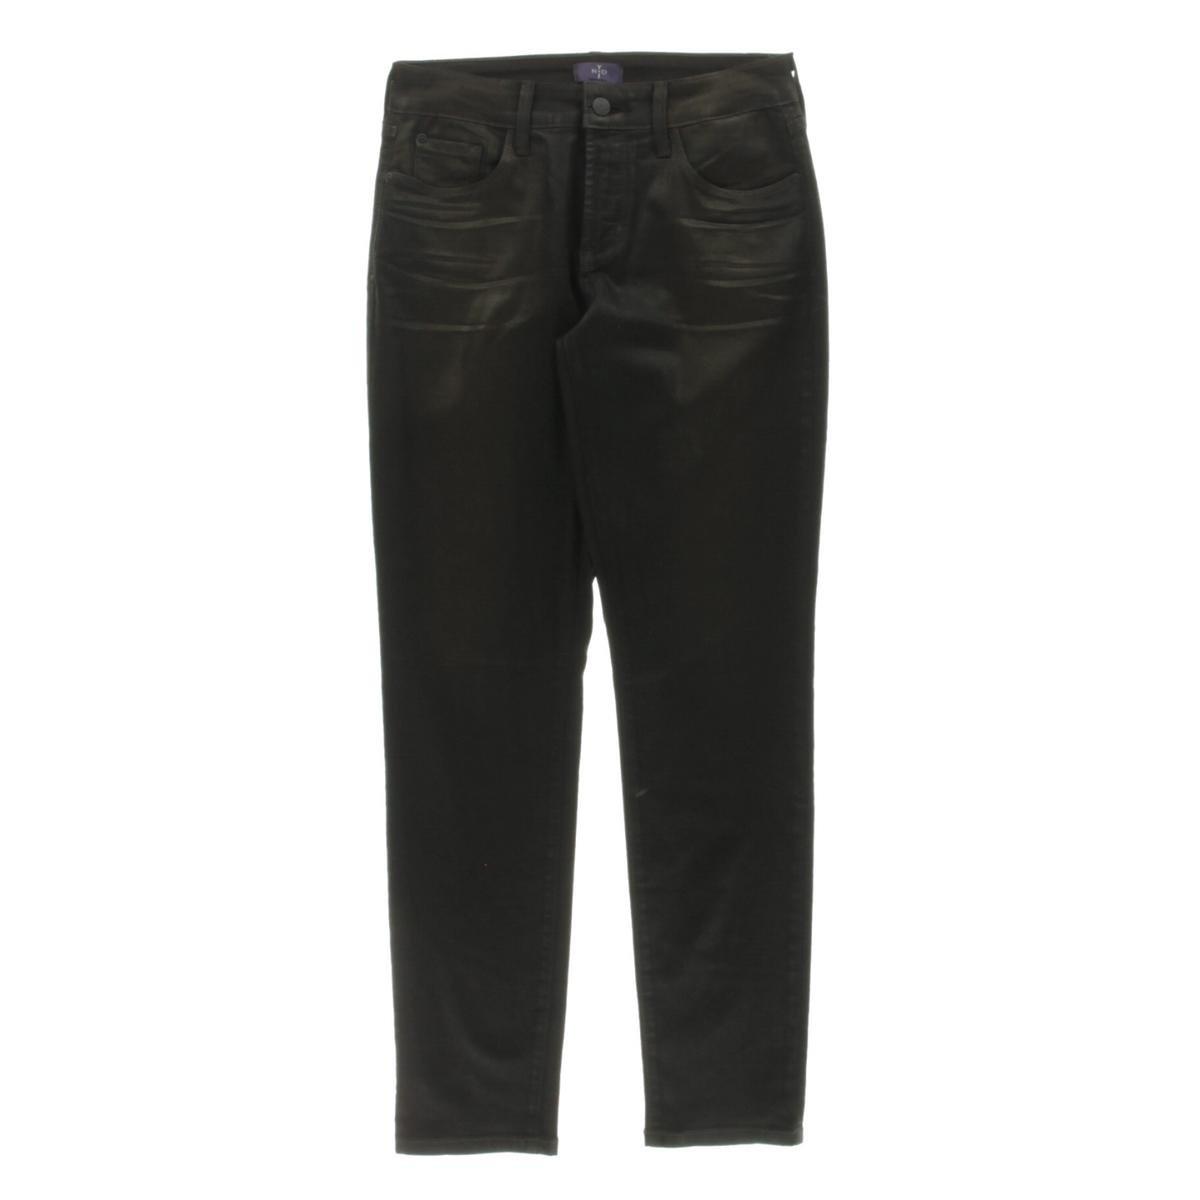 NYDJ Bronze Coated Legging Petite Not Your Daughters Jeans Pants